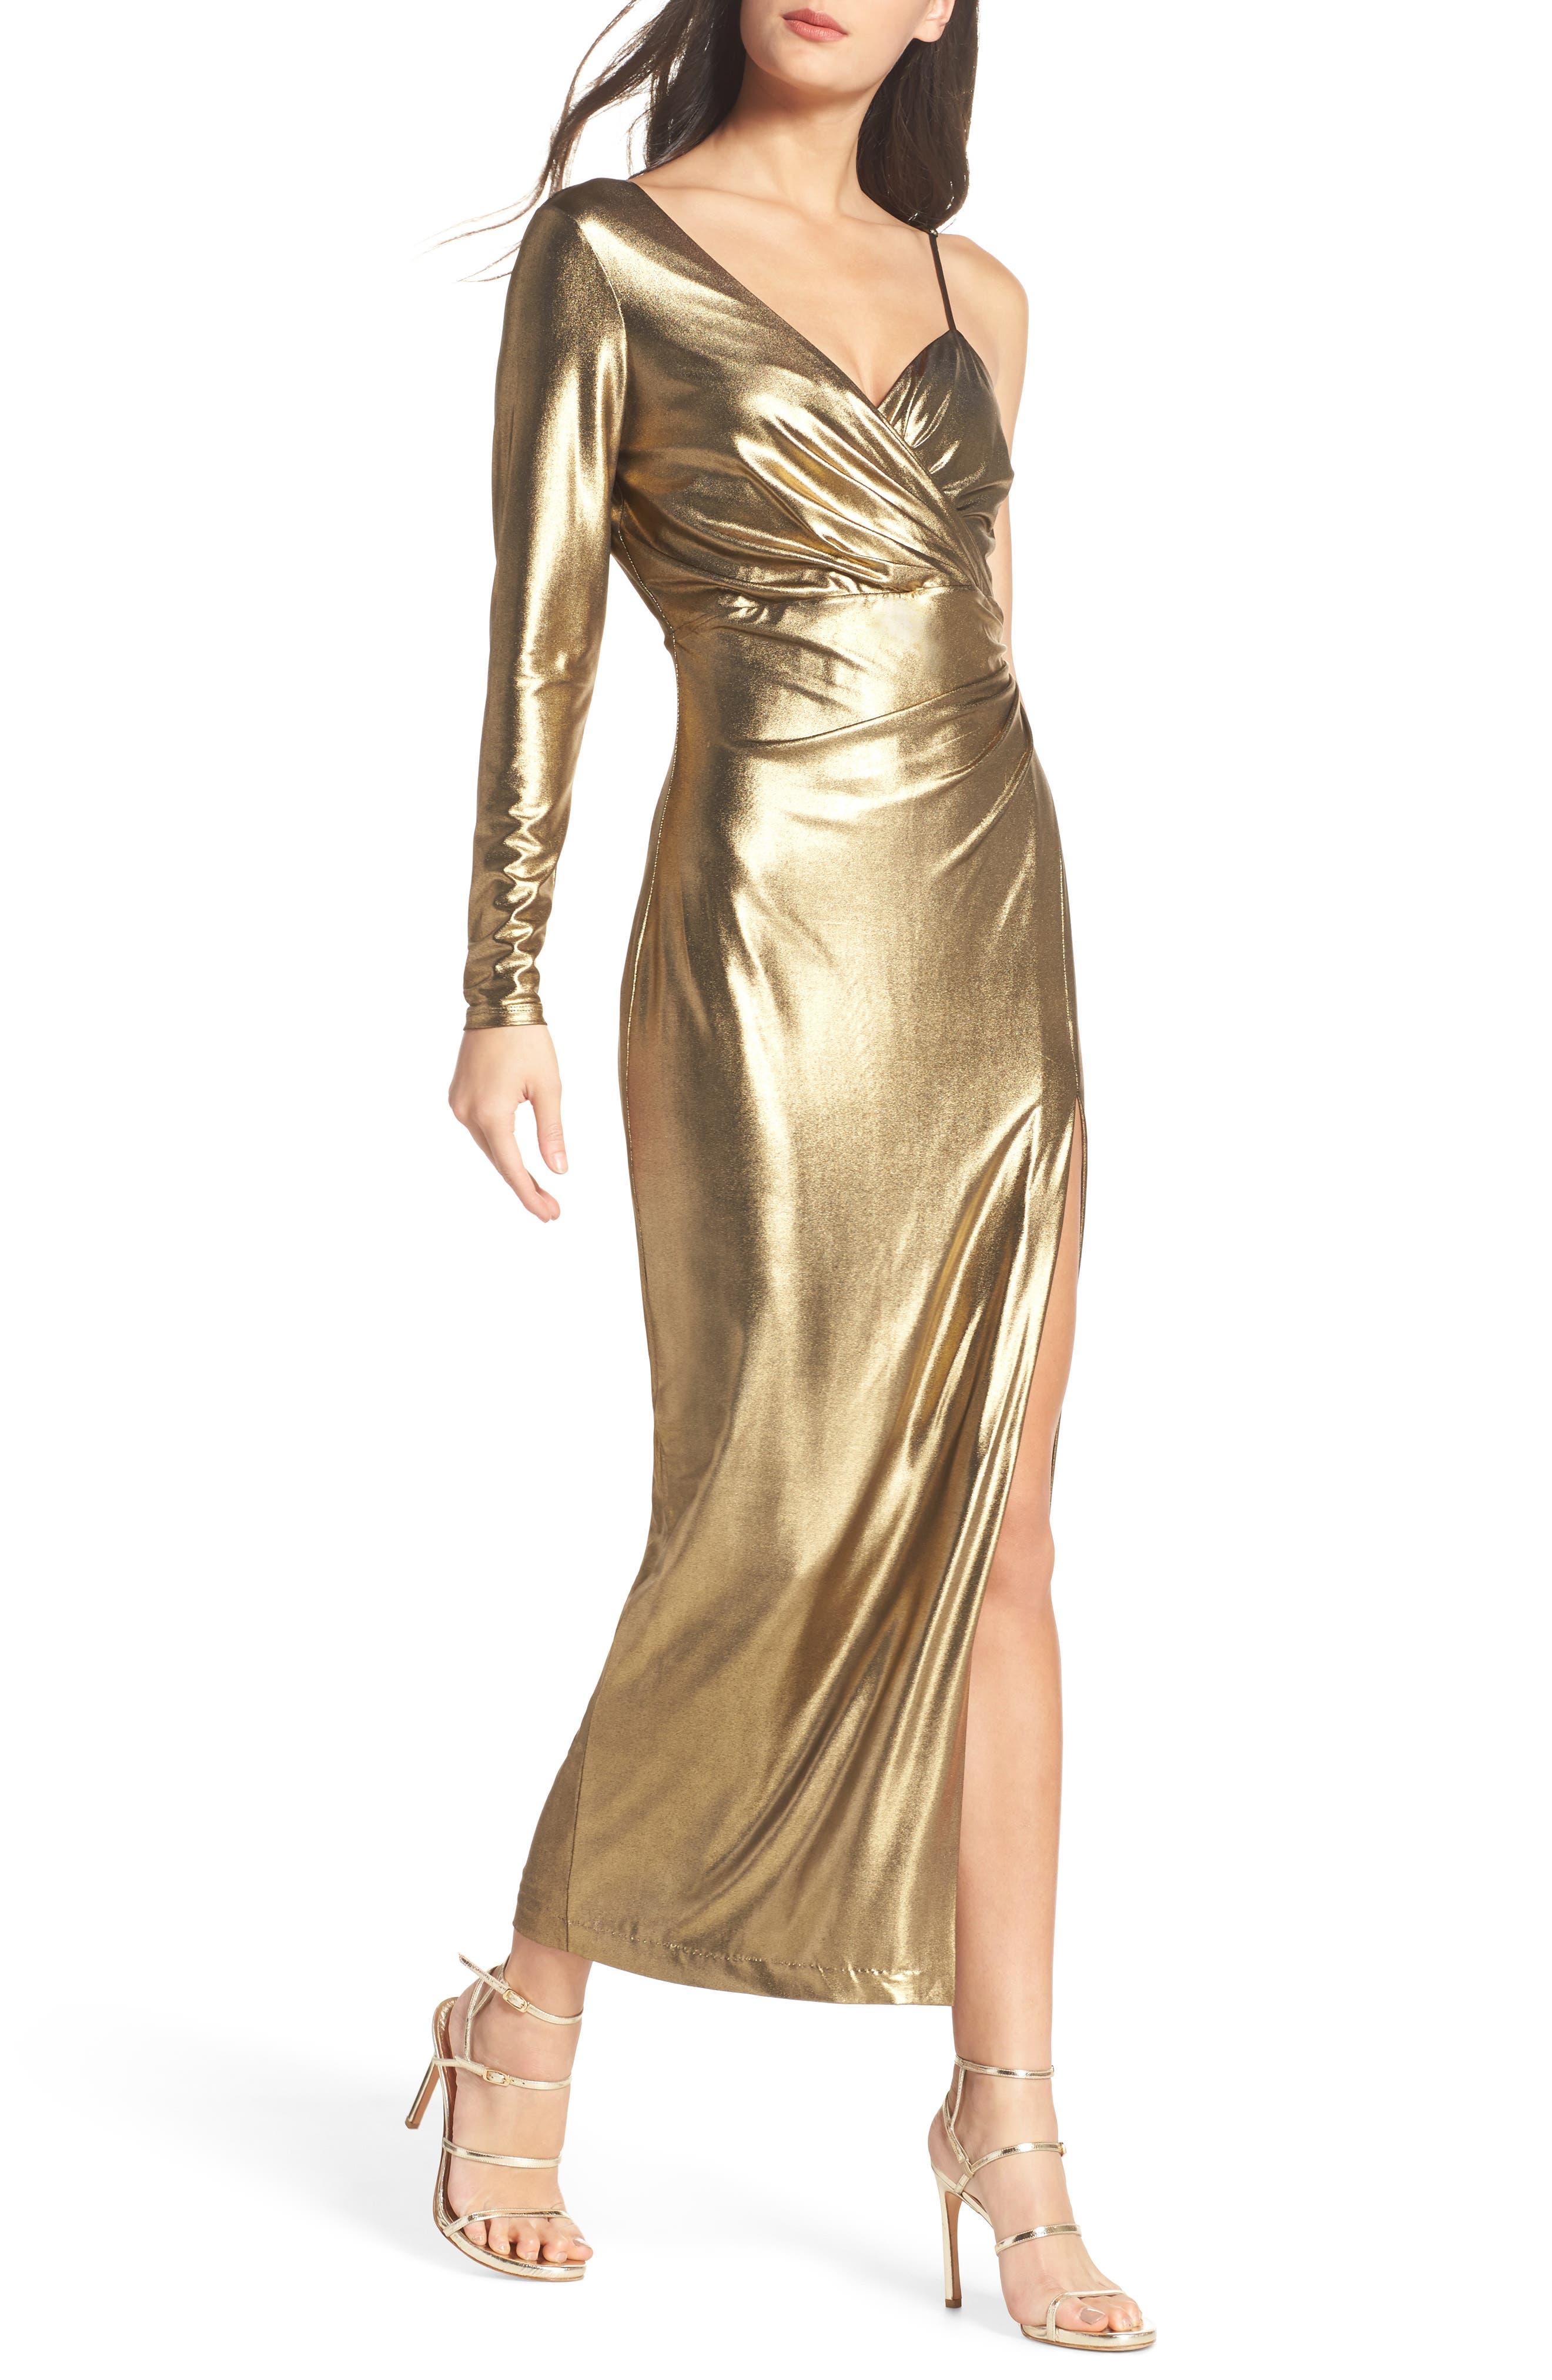 Aurel Metallic Dress,                             Main thumbnail 1, color,                             Golden